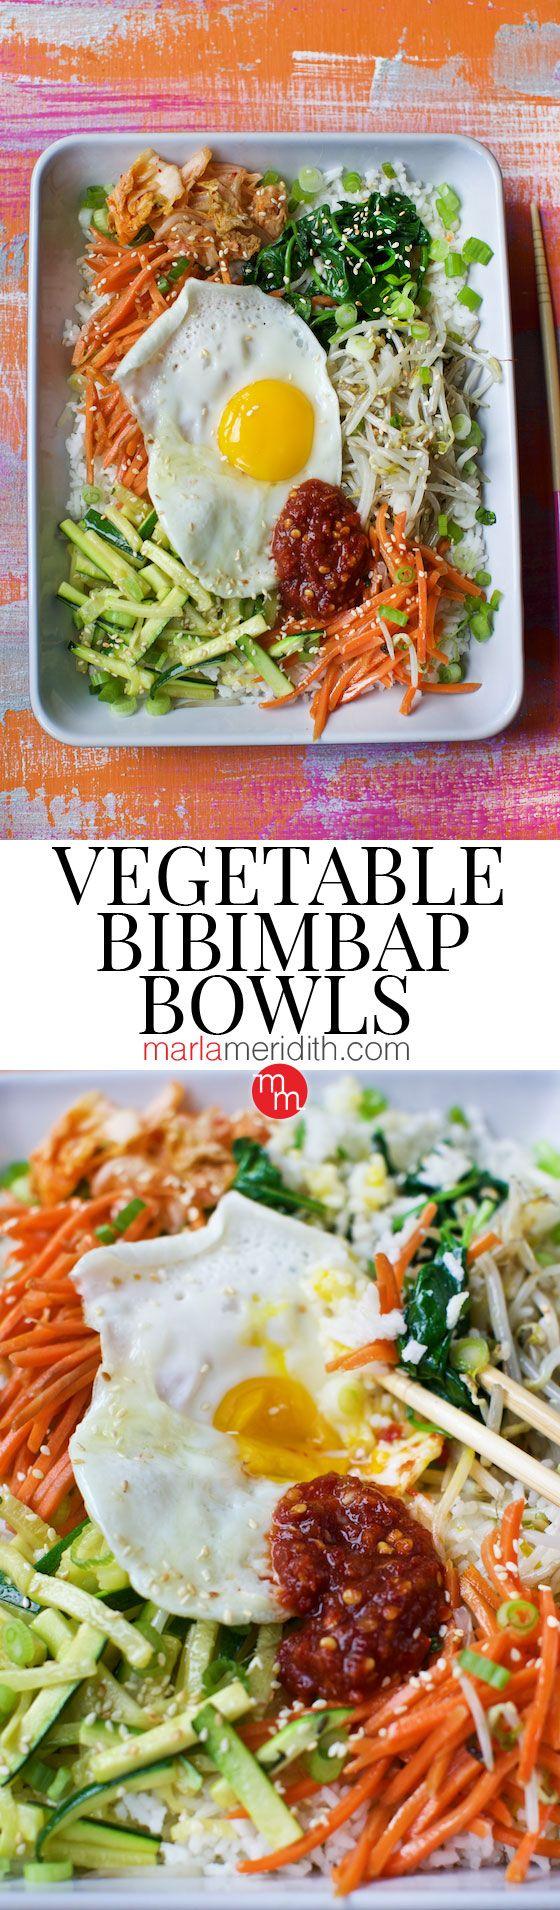 Vegetable Bibimbap Bowls recipe   MarlaMeridith.com ( @marlameridith )